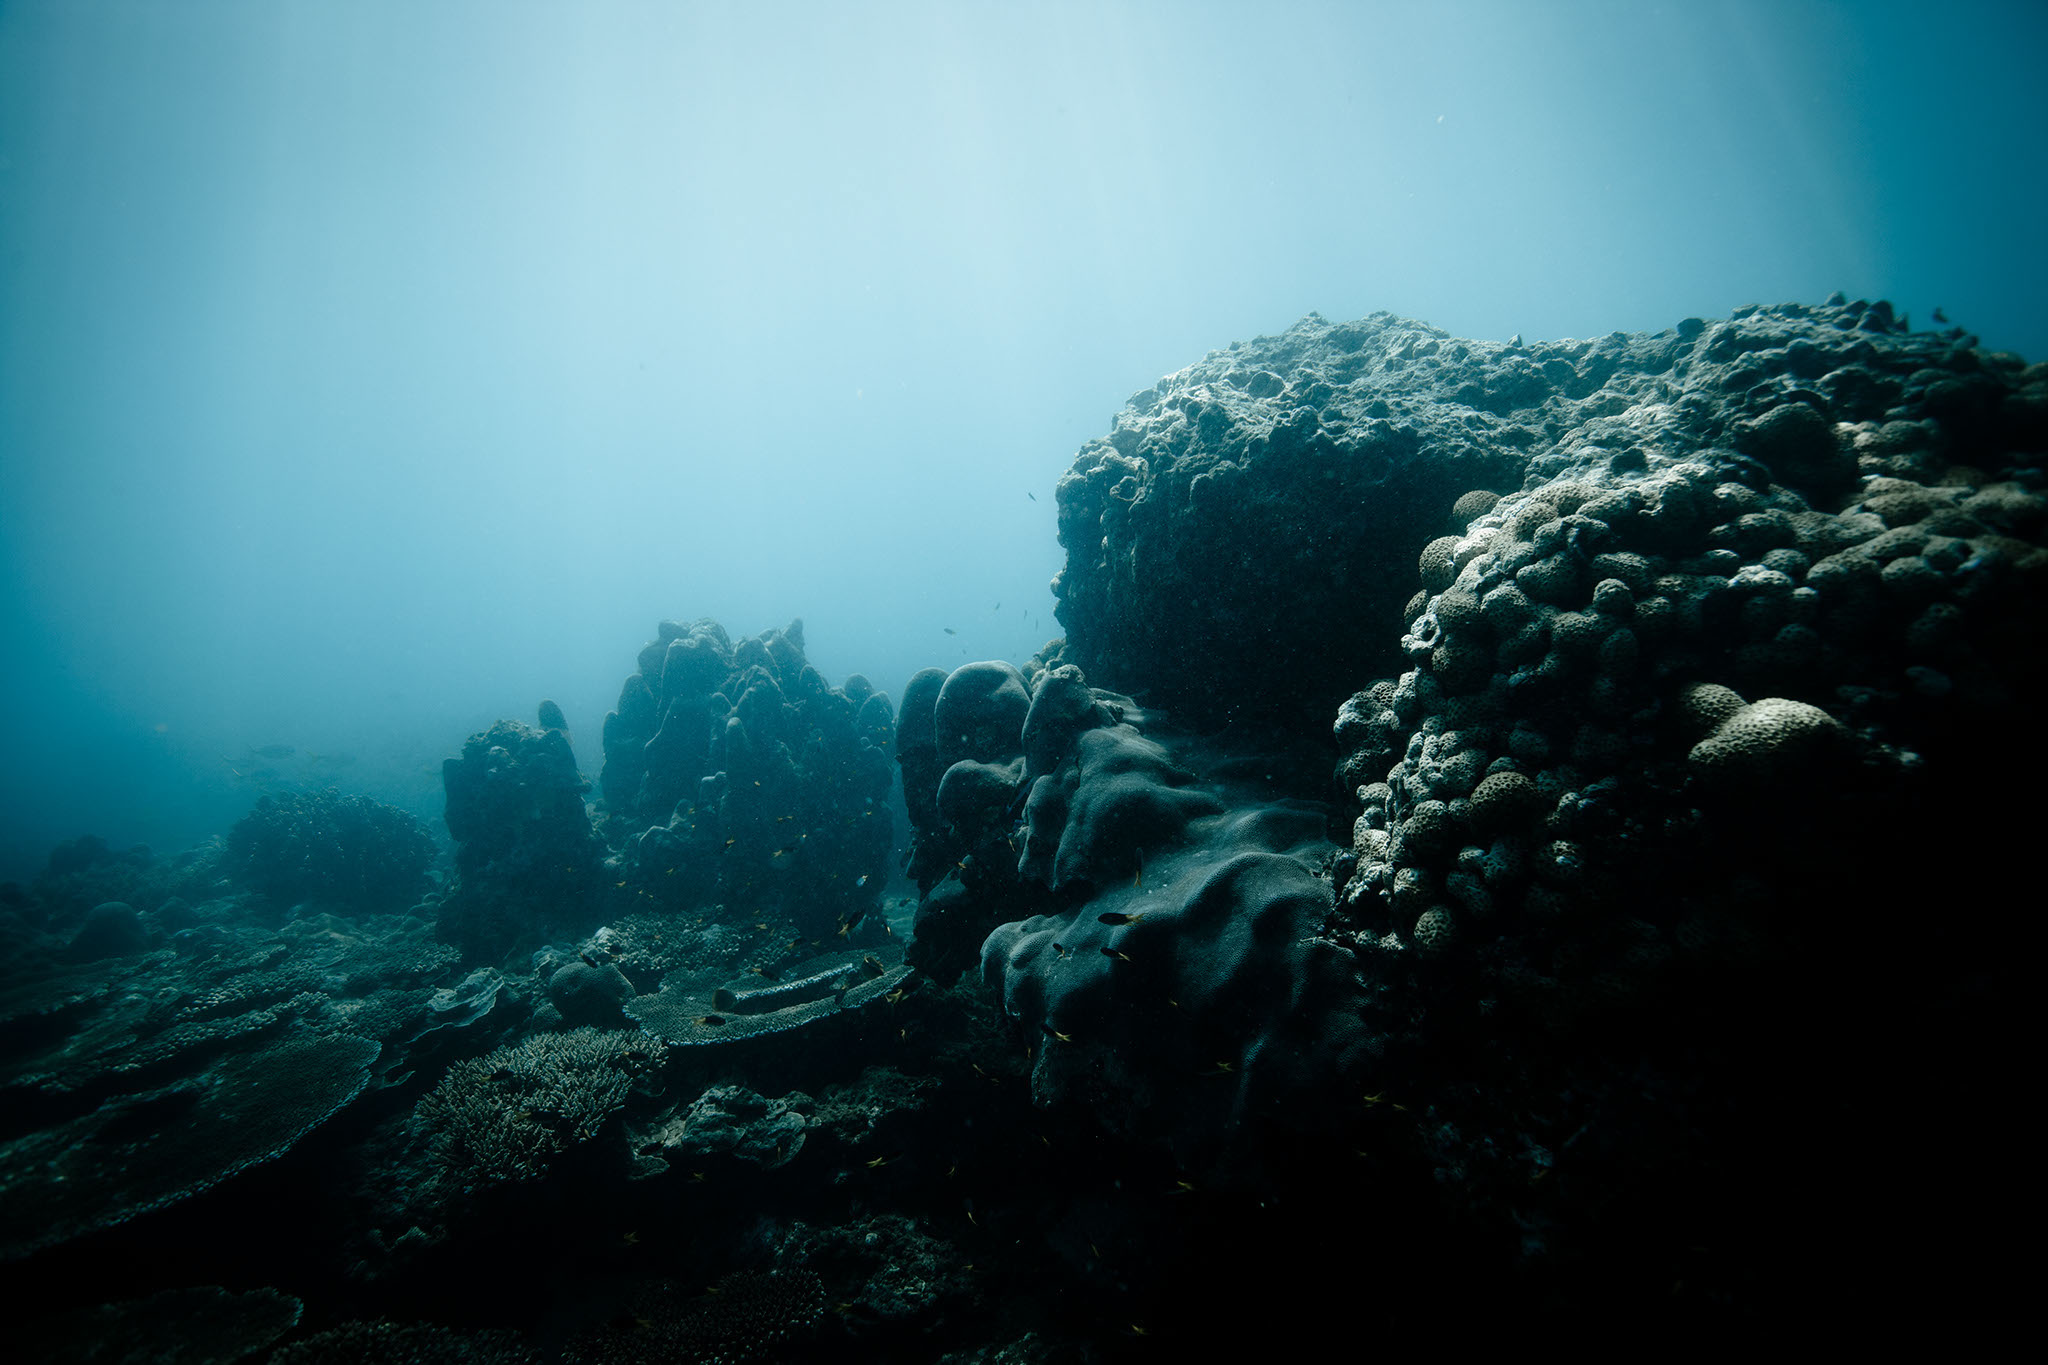 TimWatters-Underwater-01.jpg